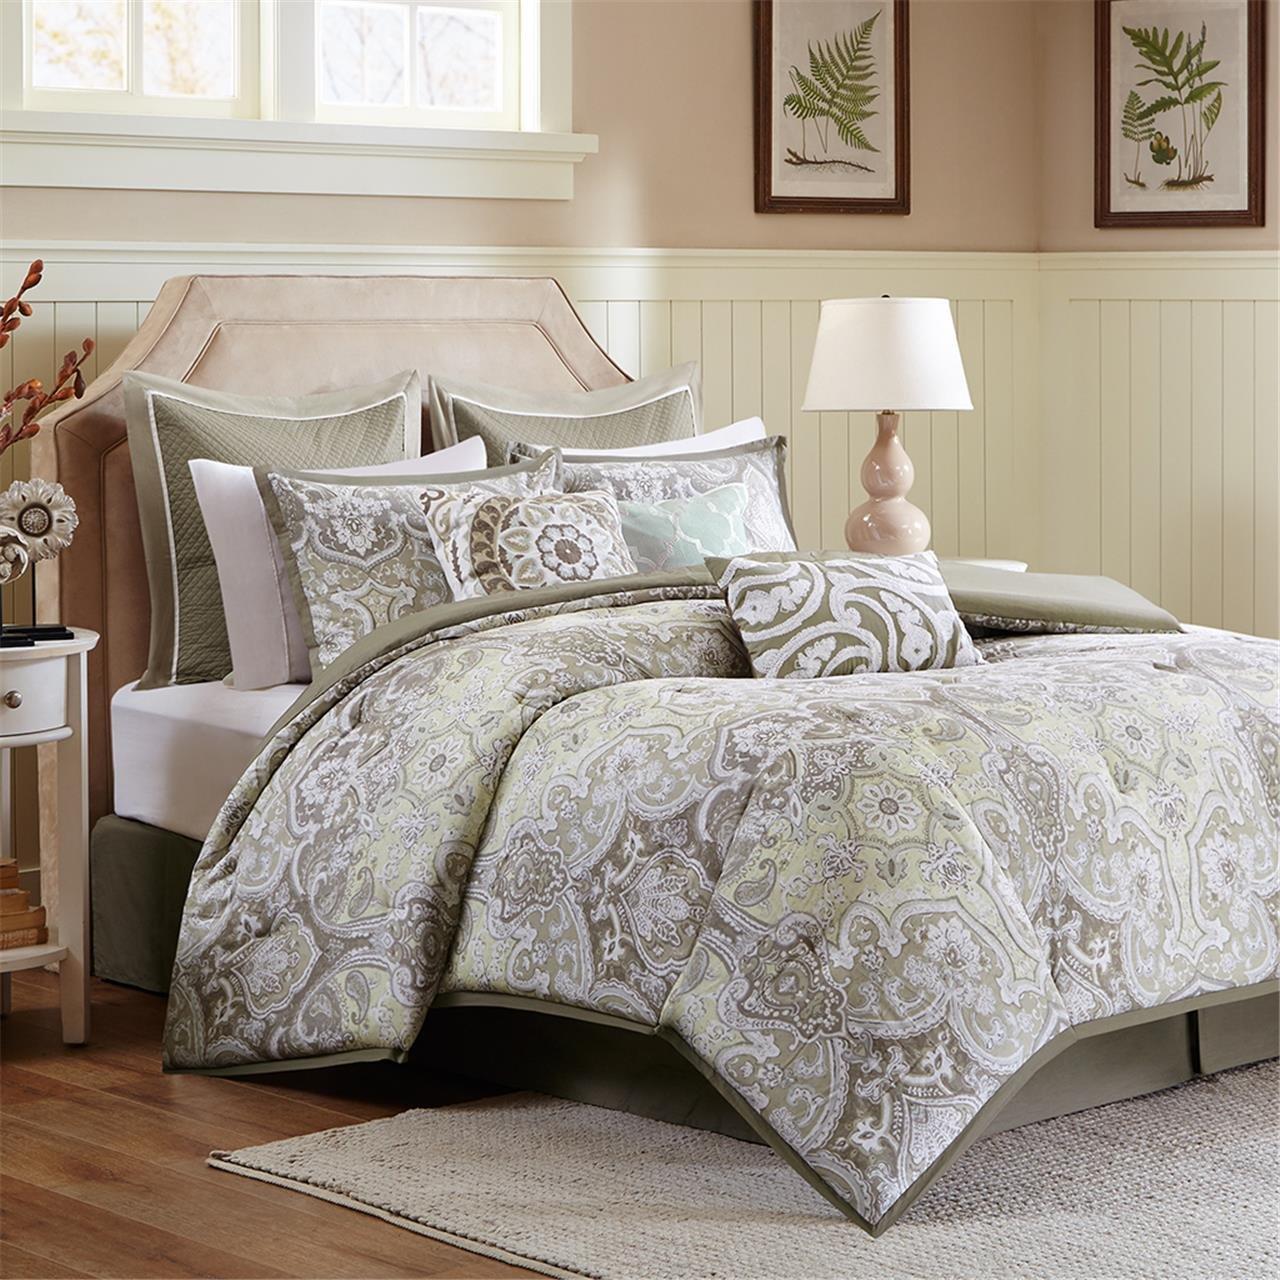 Elegant Amazon.com: Harbor House Cecil Comforter Set, Taupe, Queen: Home U0026 Kitchen